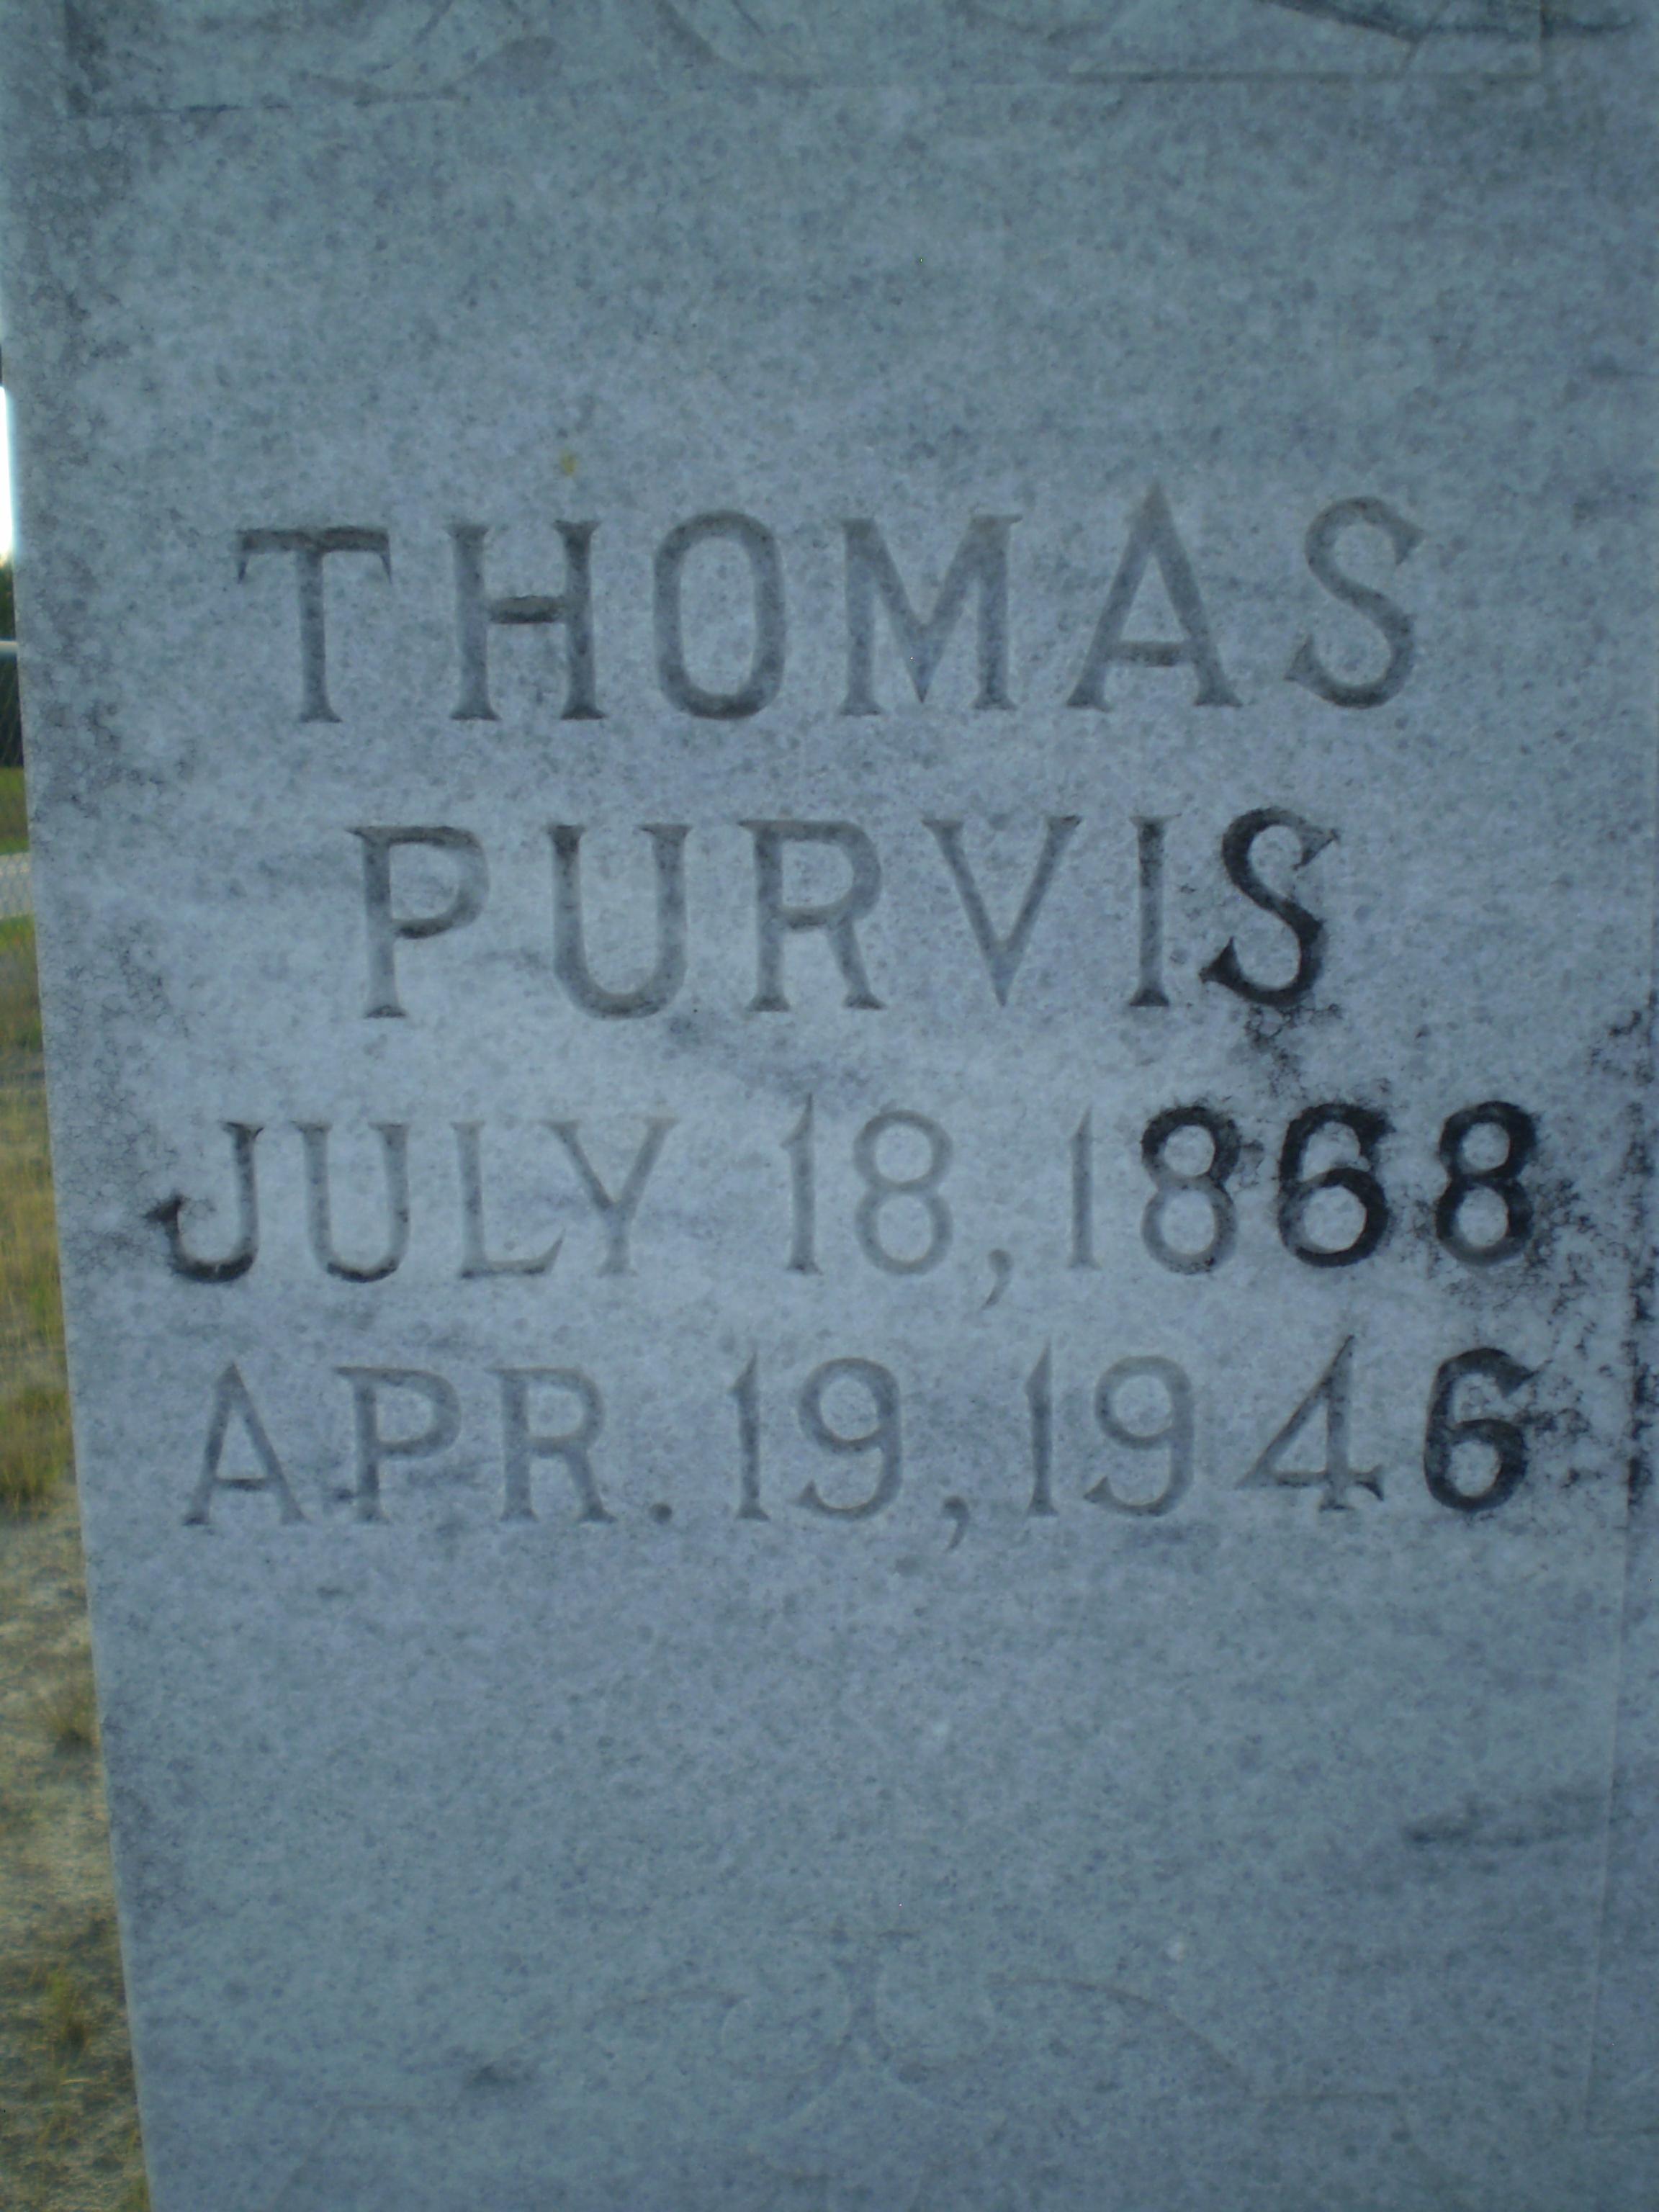 Thomas Purvis